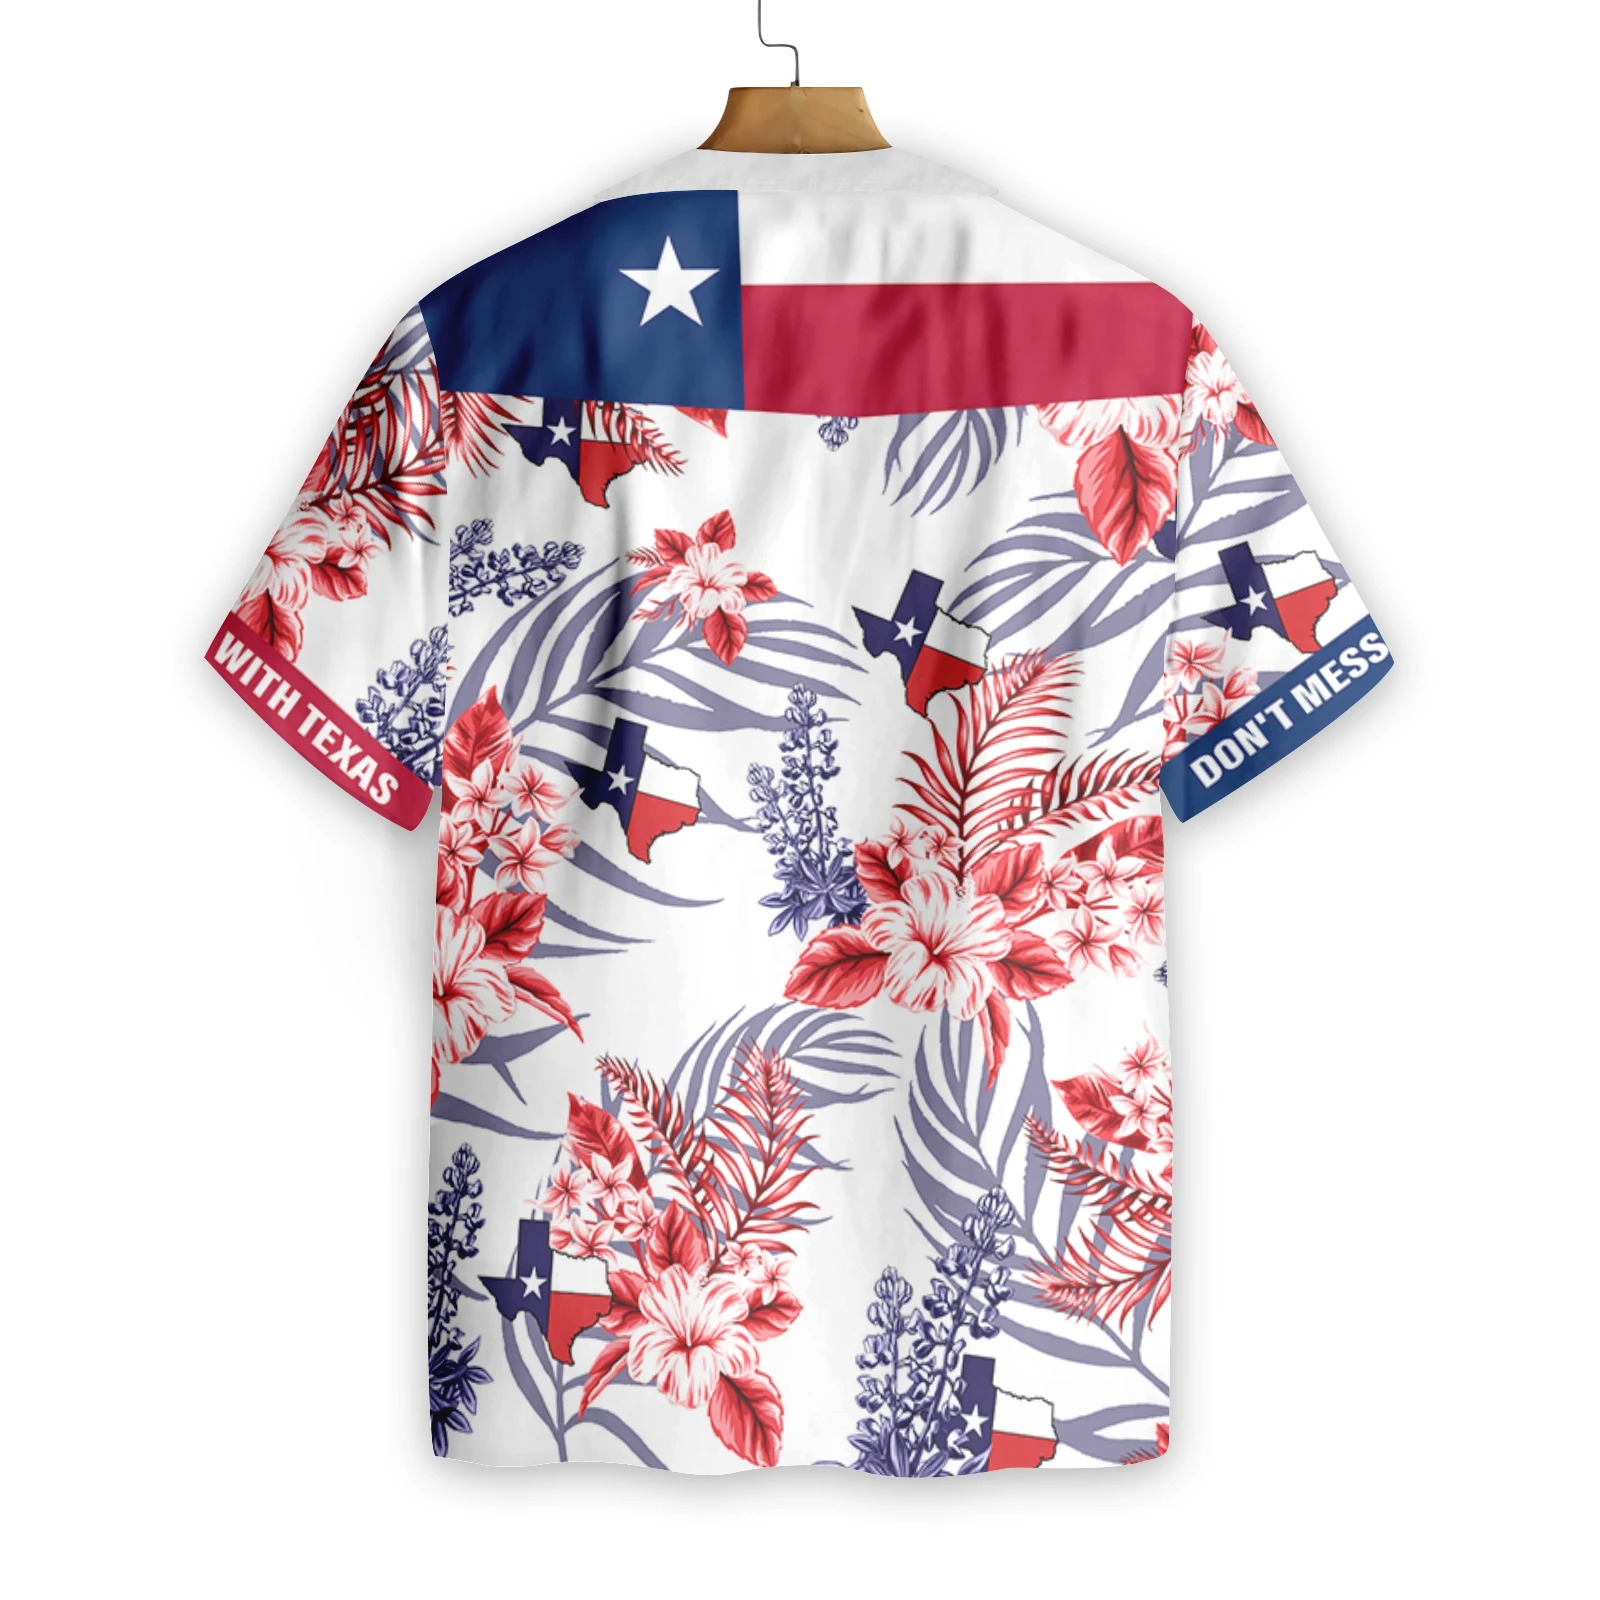 Floral Bluebonnet Don't Mess With Texas Hawaiian Shirt